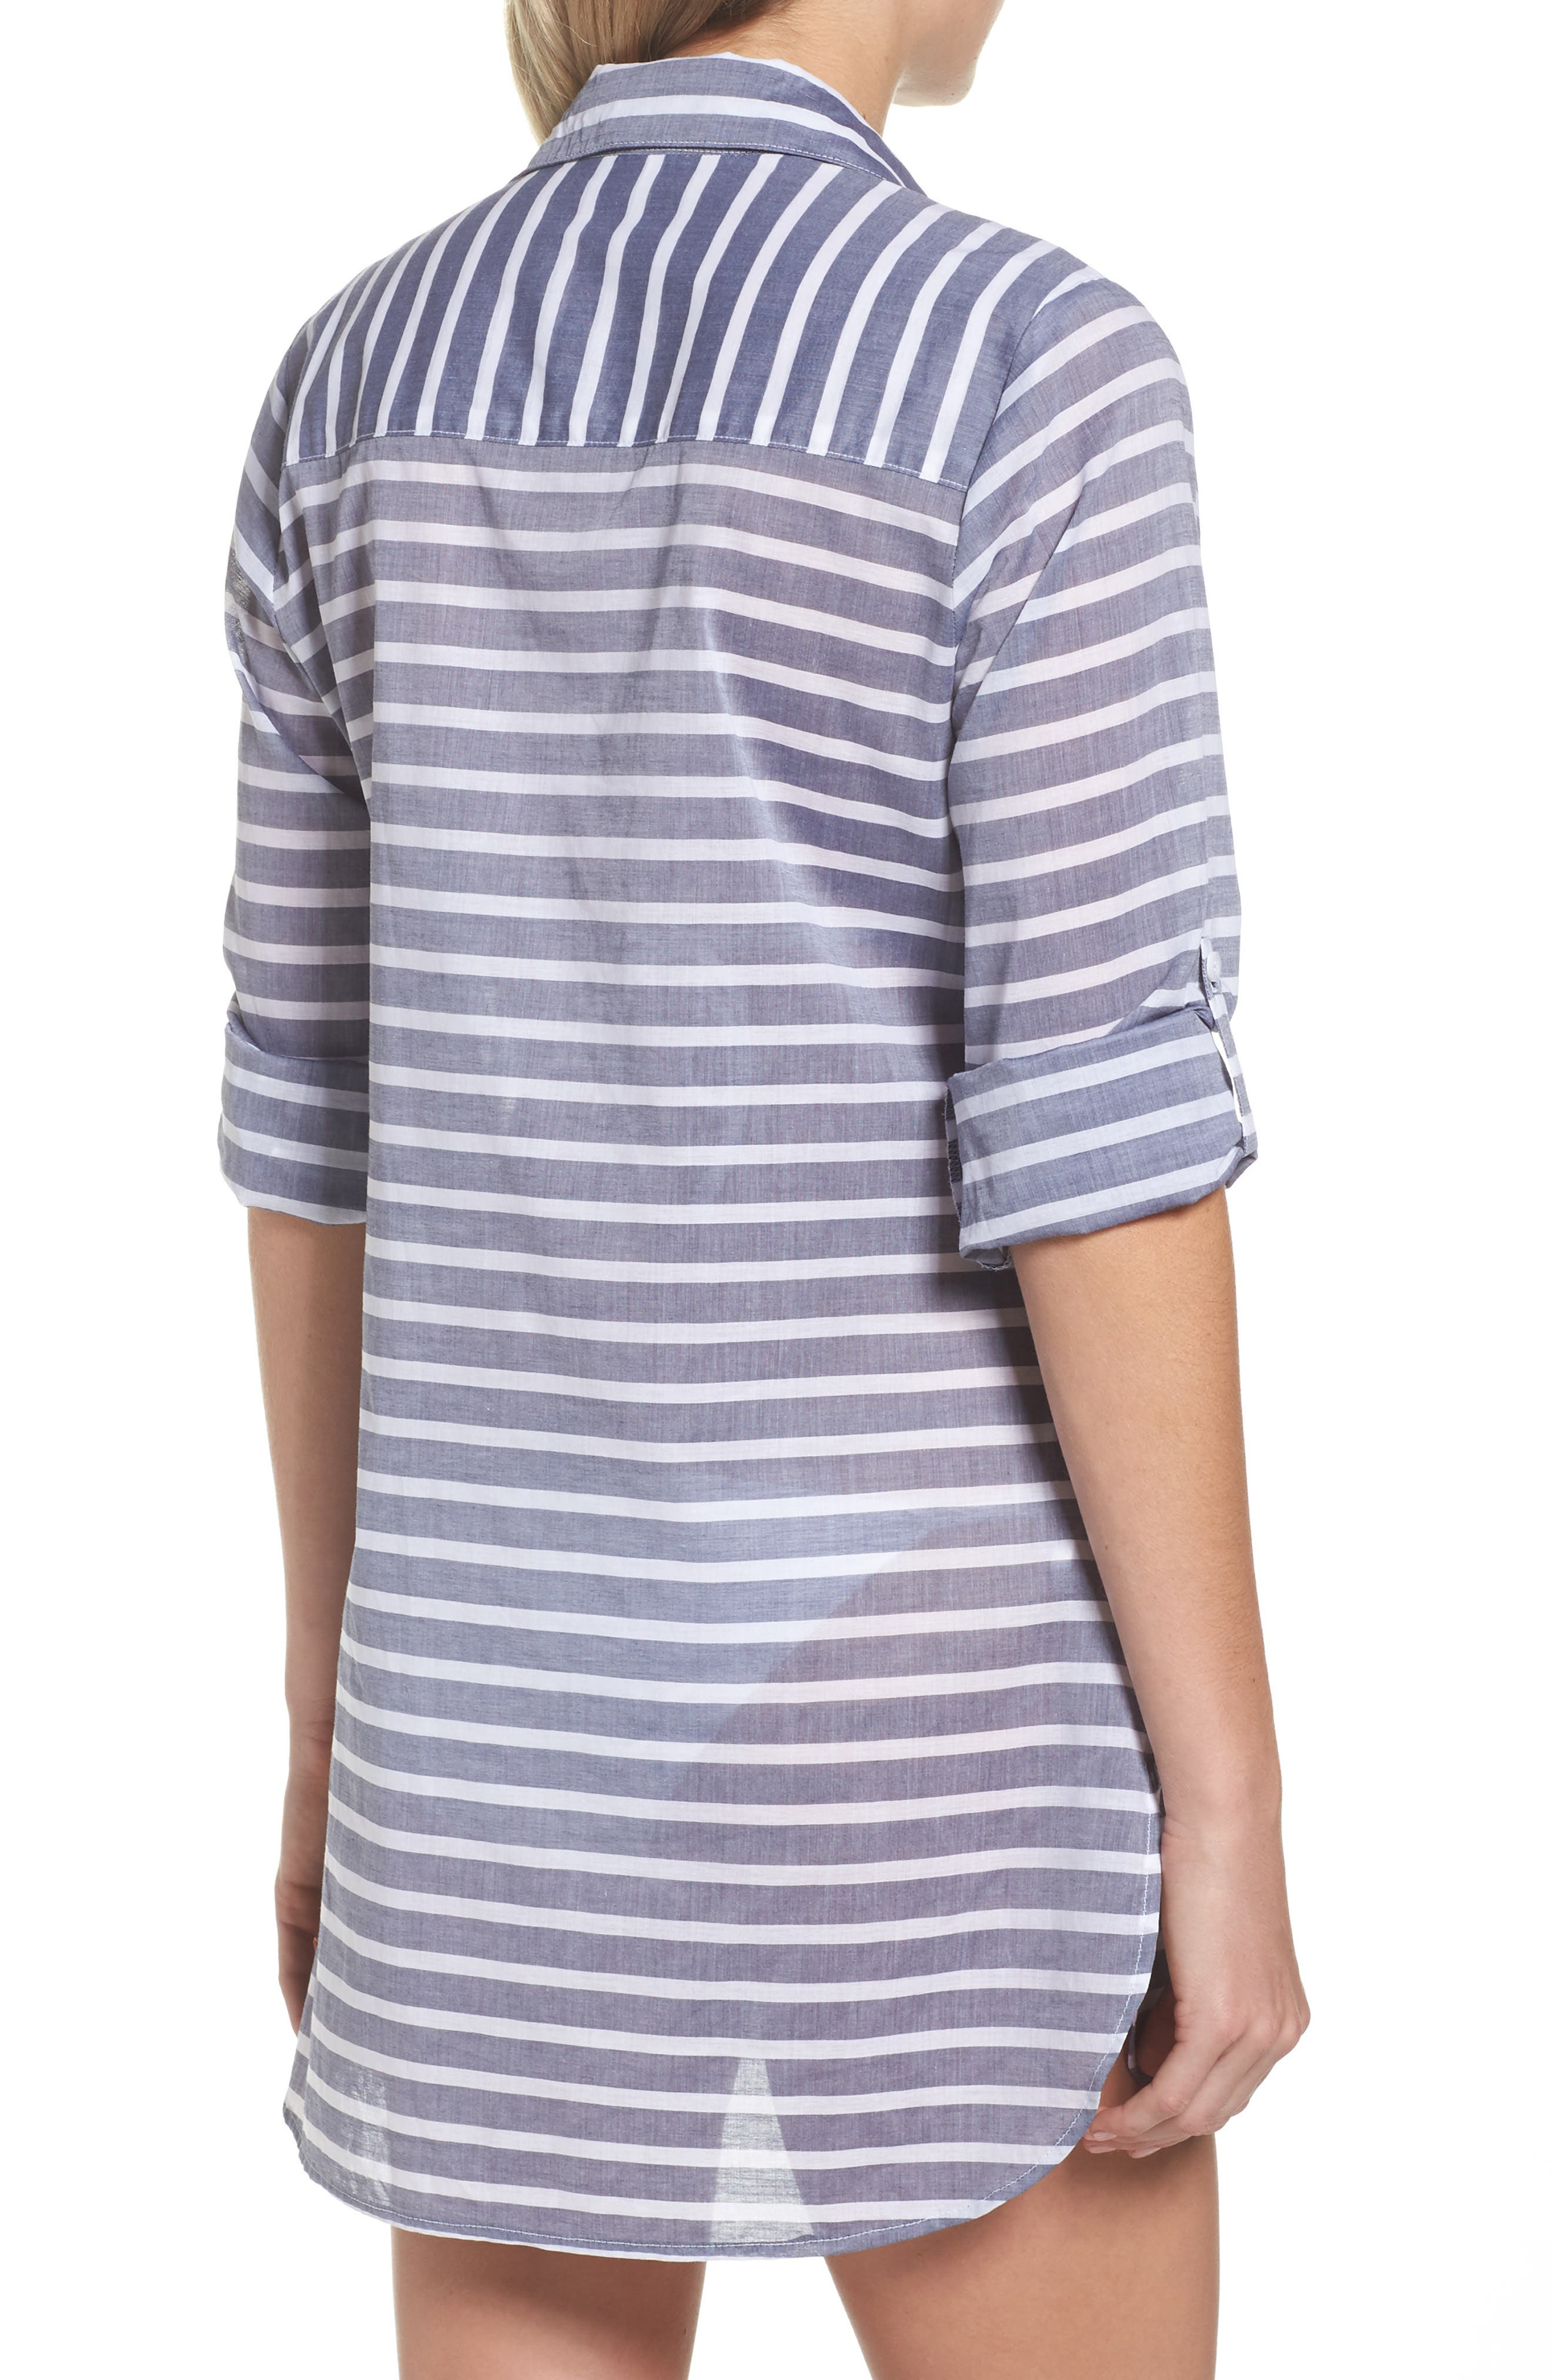 Alternate Image 2  - Tommy Bahama Brenton Stripe Boyfriend Shirt Cover-Up